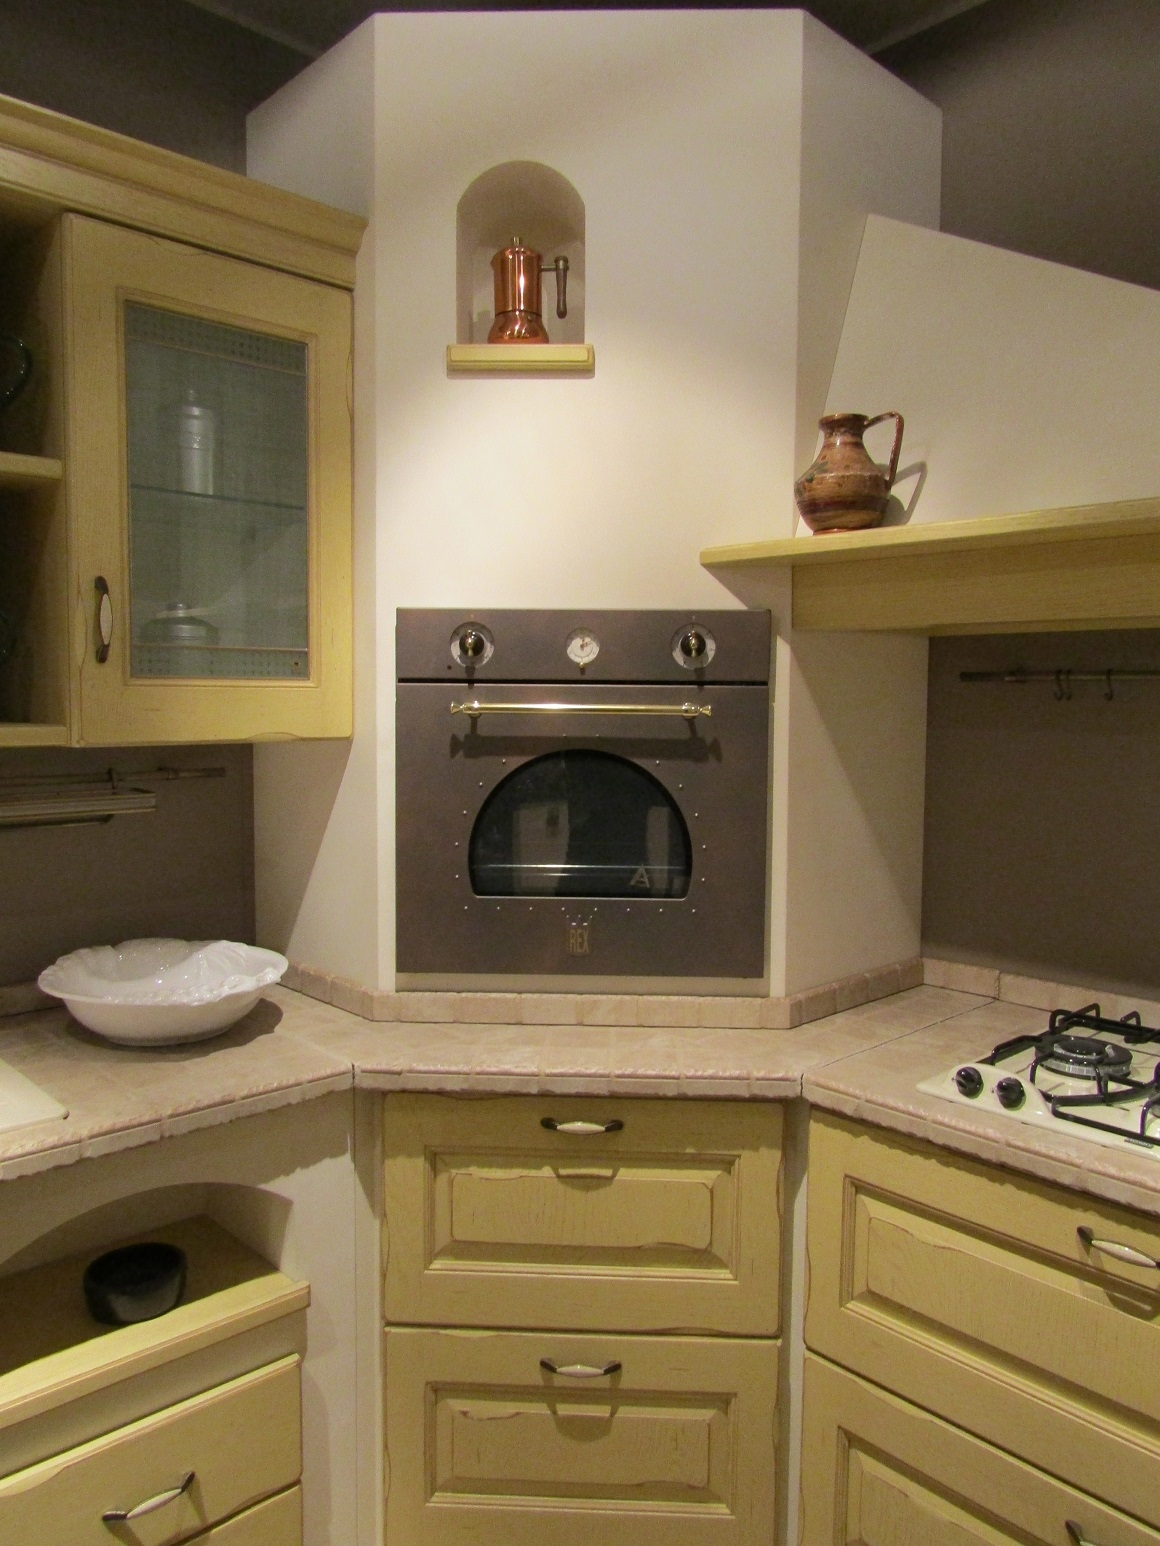 Cucine Incassate In Muratura. Awesome Cucine Incassate In Muratura ...